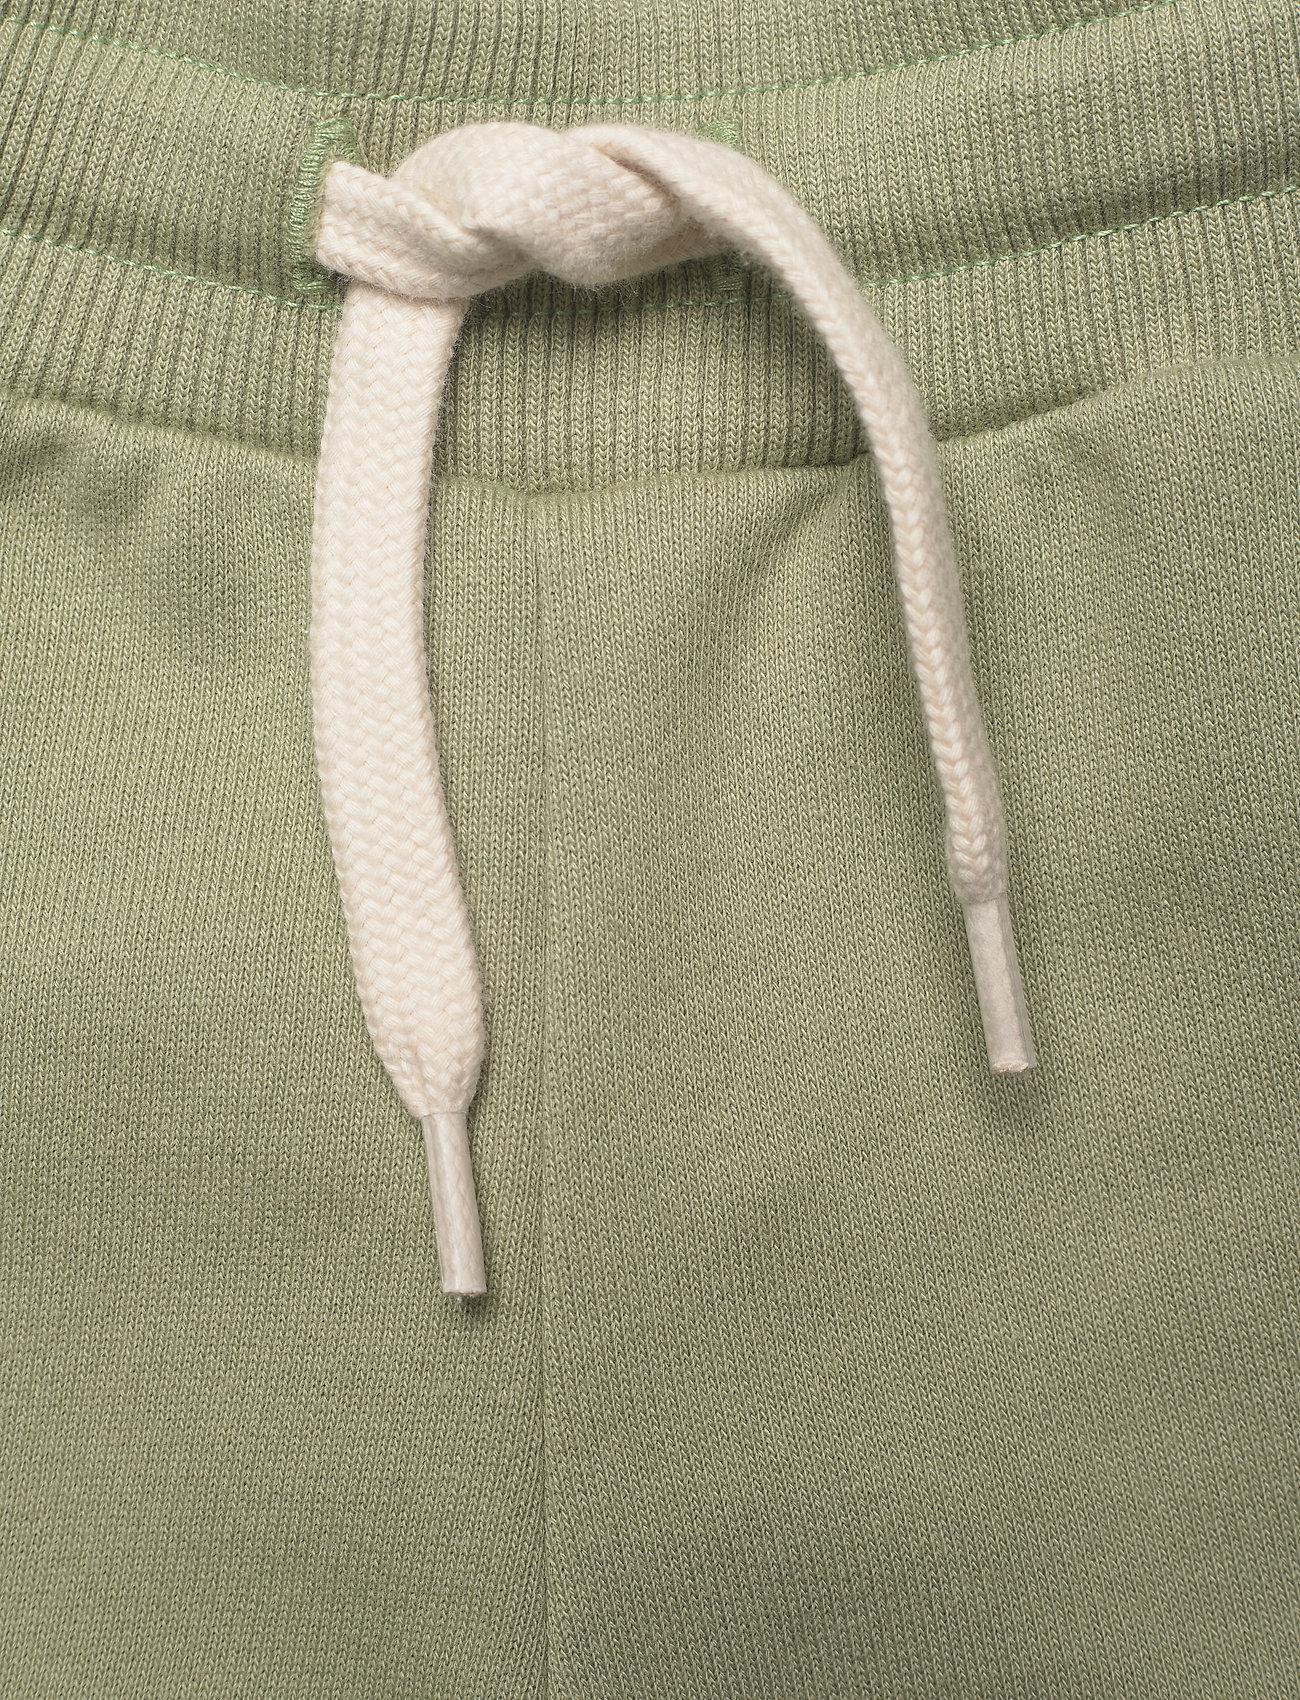 Mini A Ture - Even pants, K - sweatpants - oil green - 3